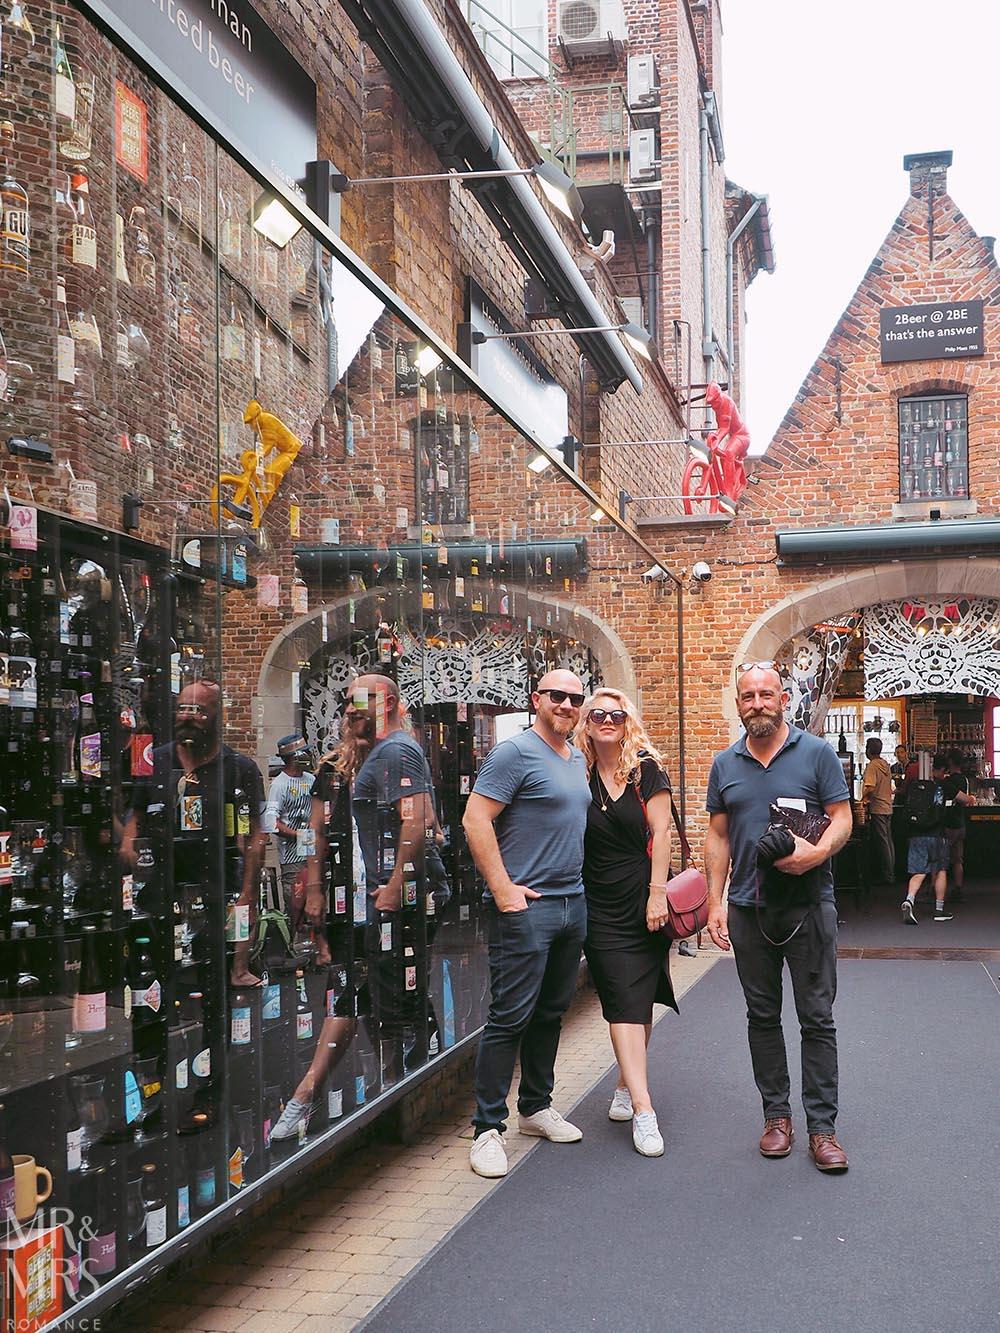 Bruges, Belgium - Wall of Beers